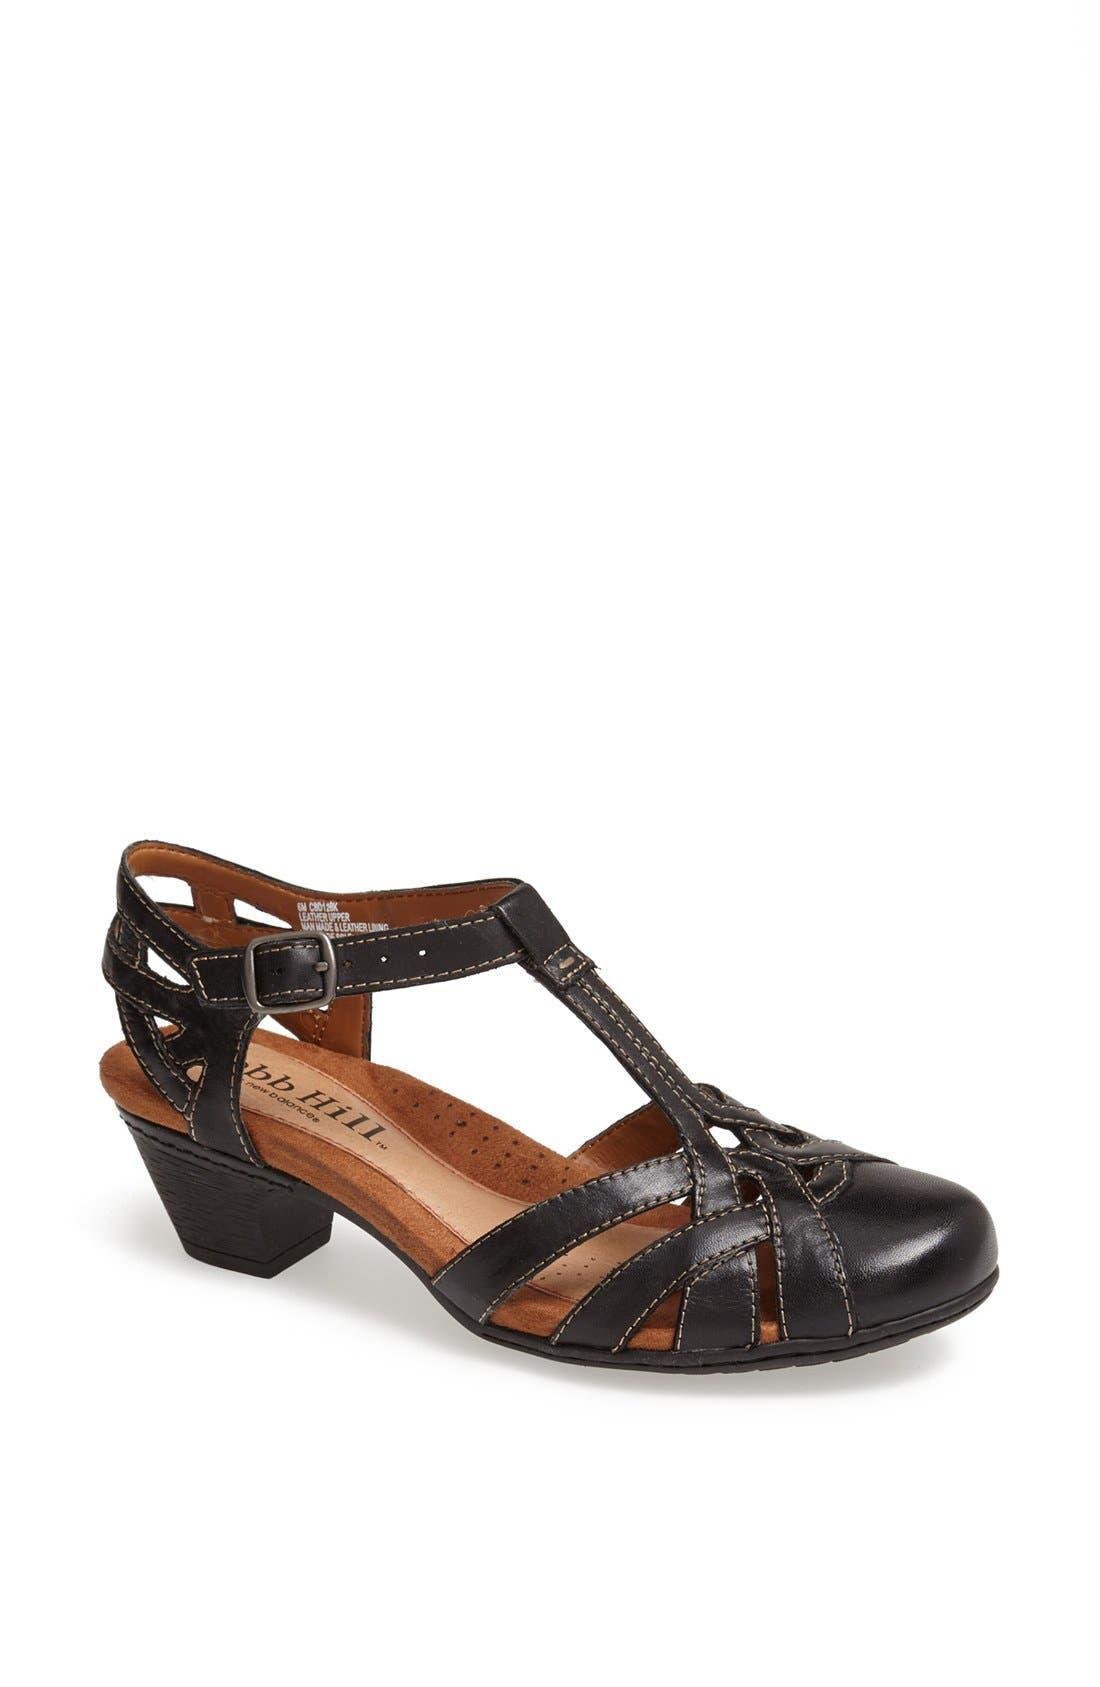 1940s Style Shoes, 40s Shoes, Heels, Boots Womens Rockport Cobb Hill Aubrey Sandal Size 6 W - Black $94.95 AT vintagedancer.com